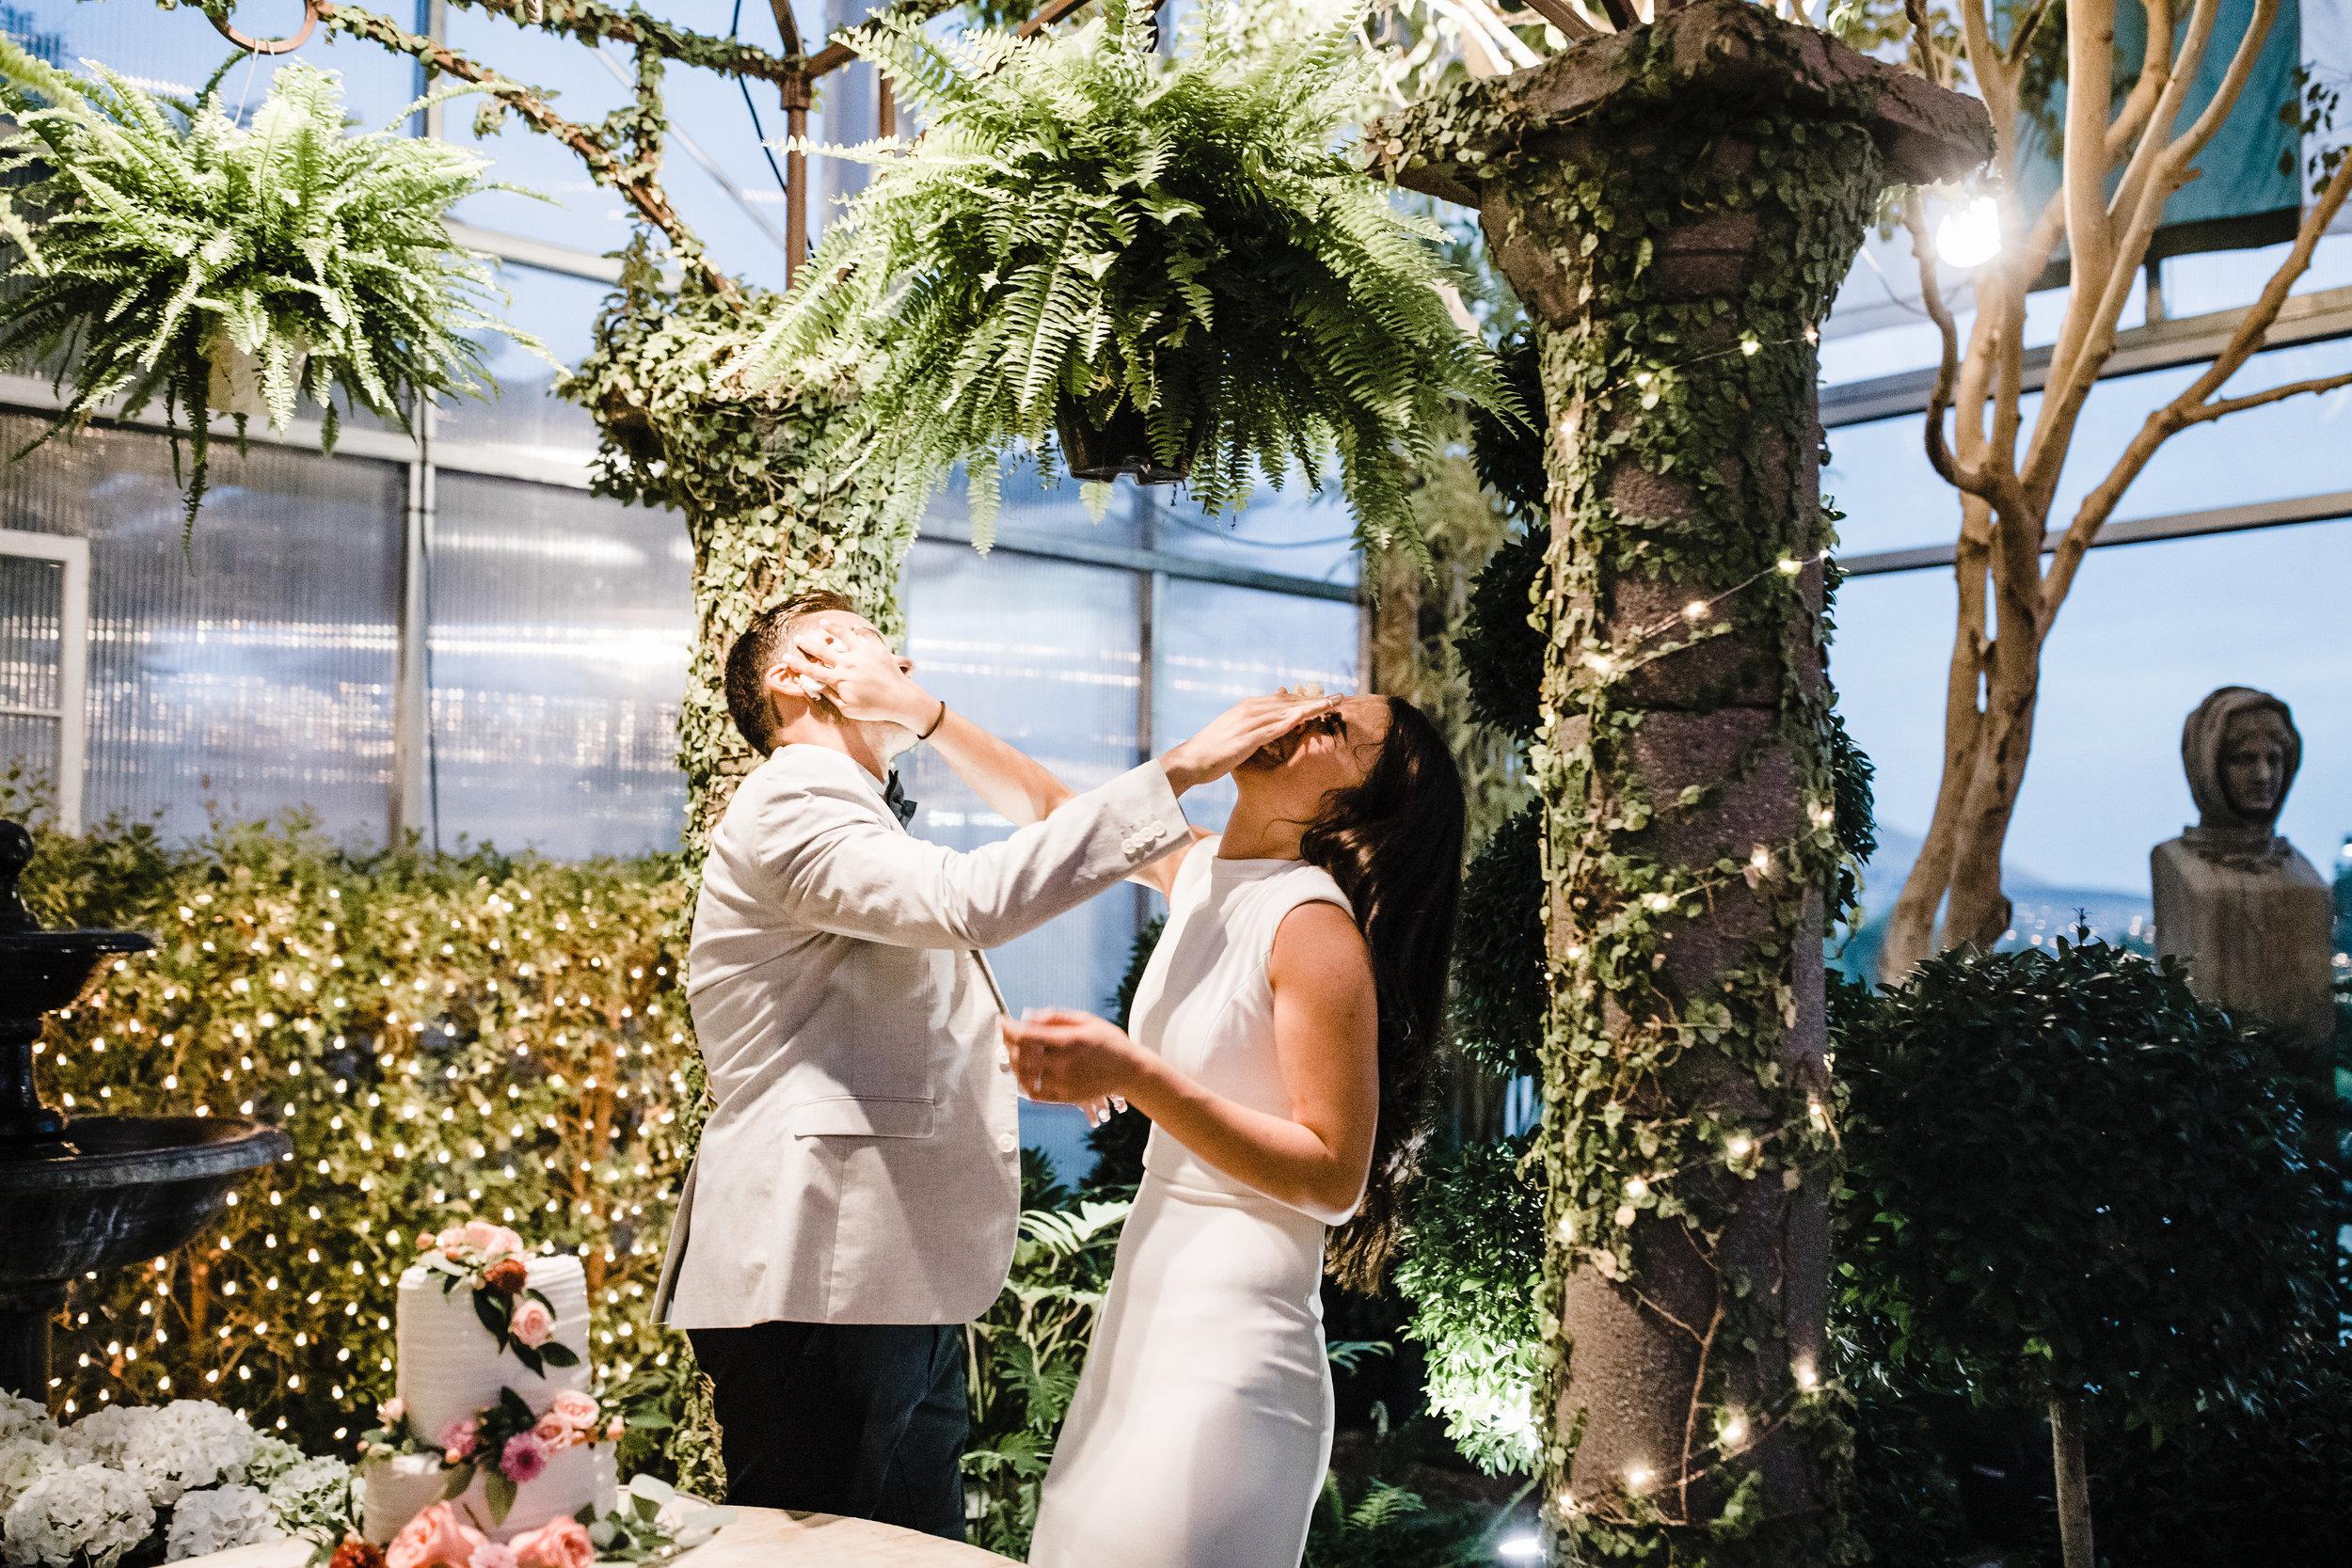 utah valley wedding photographer reception cake smash laughing